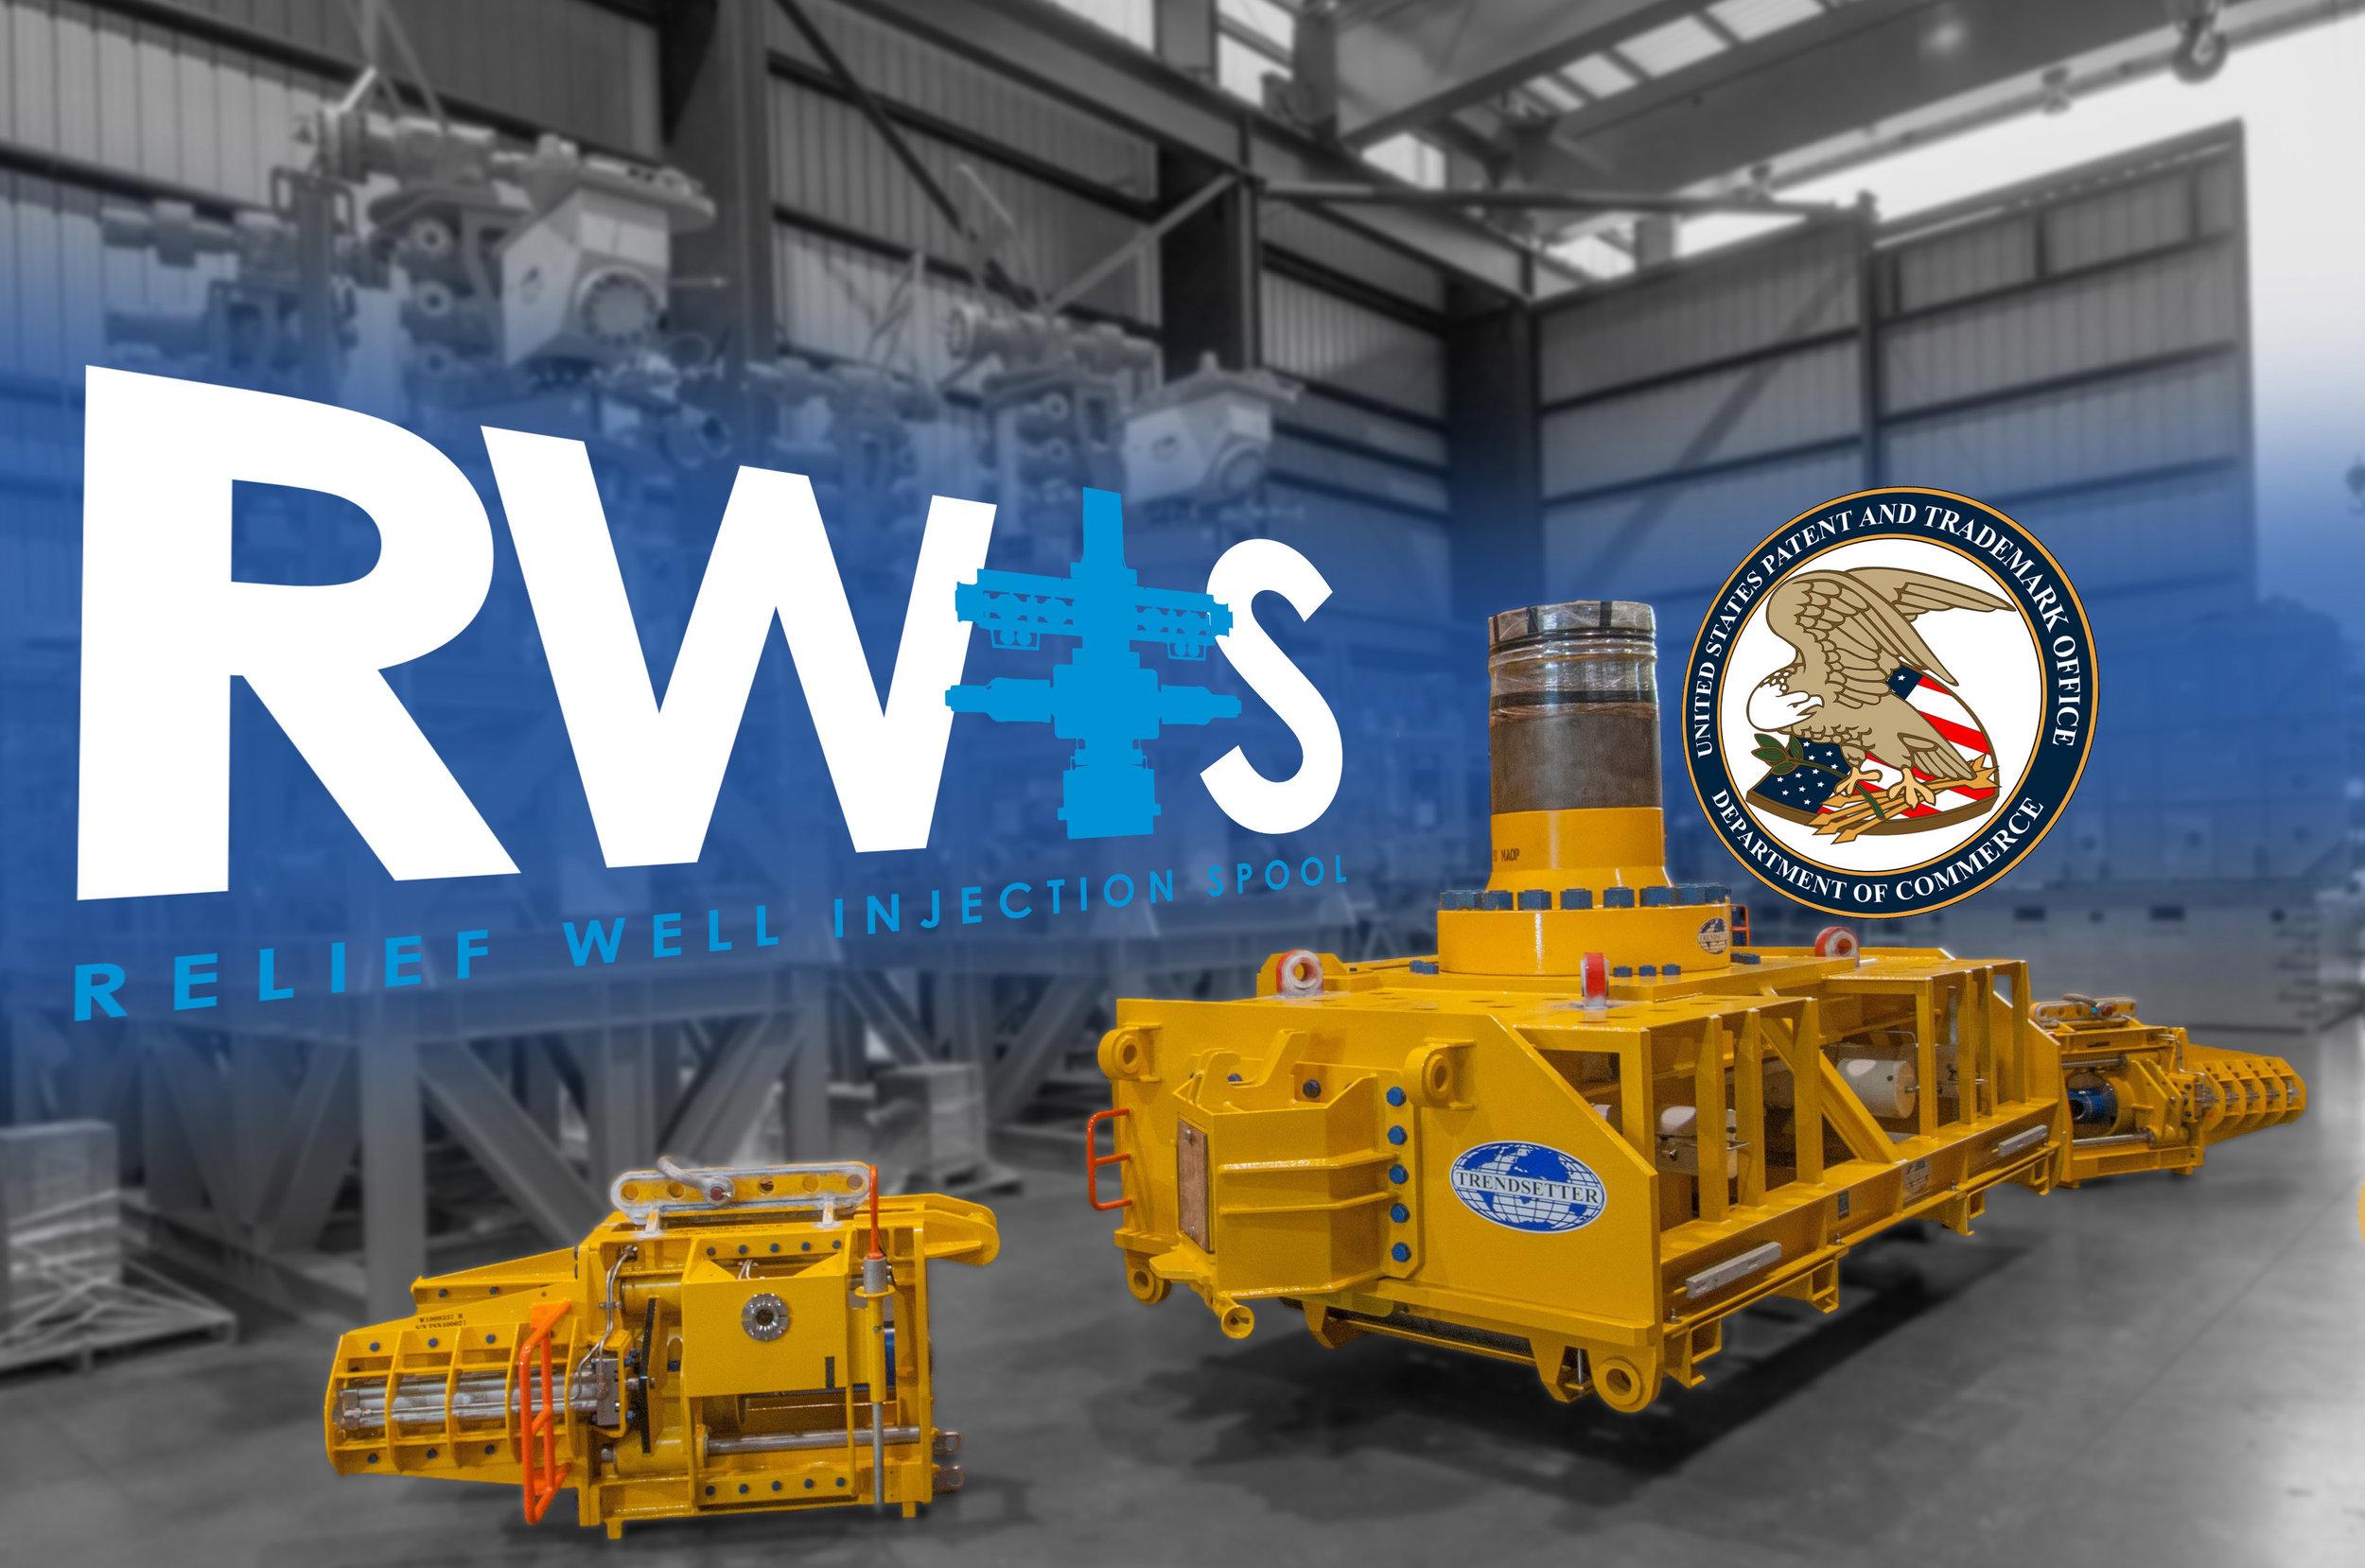 RWIS_Photo_in_Warehouse_with_logo_web.jpg